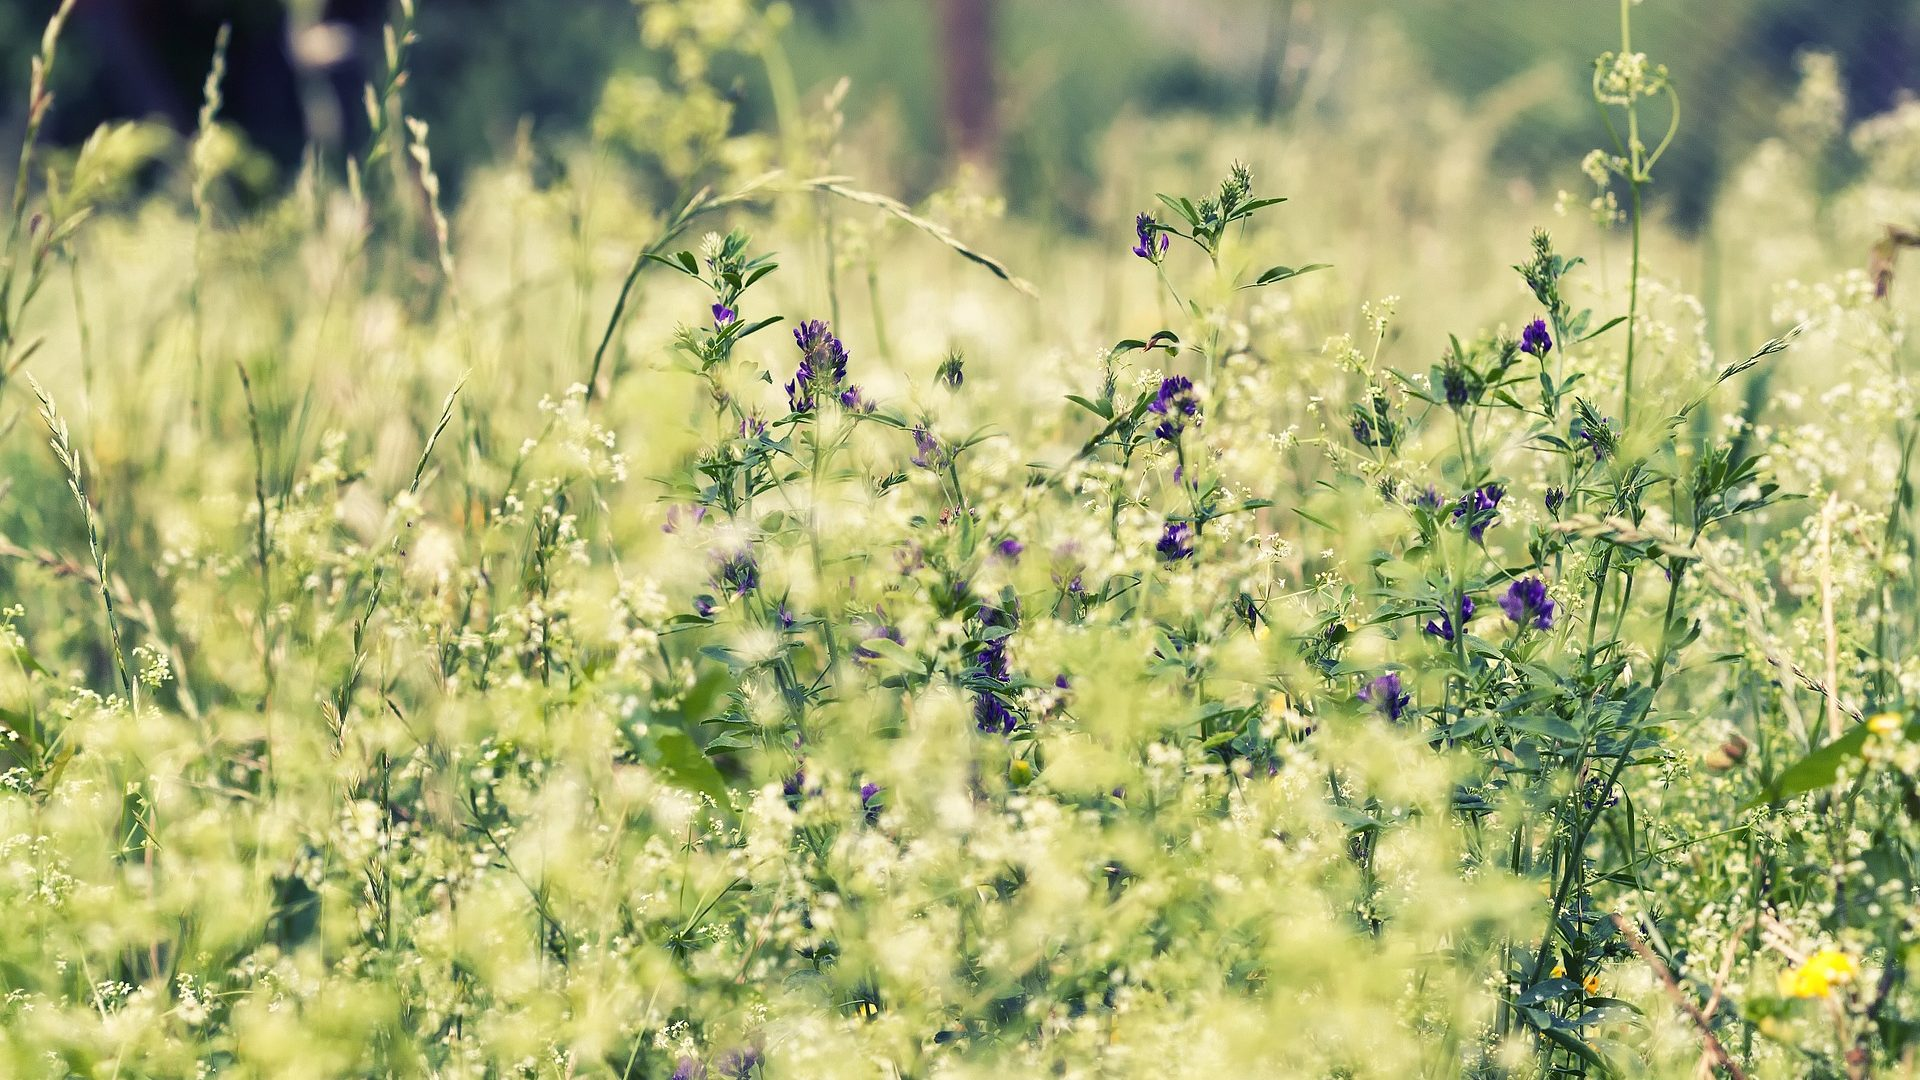 Natur, Wiese, grün